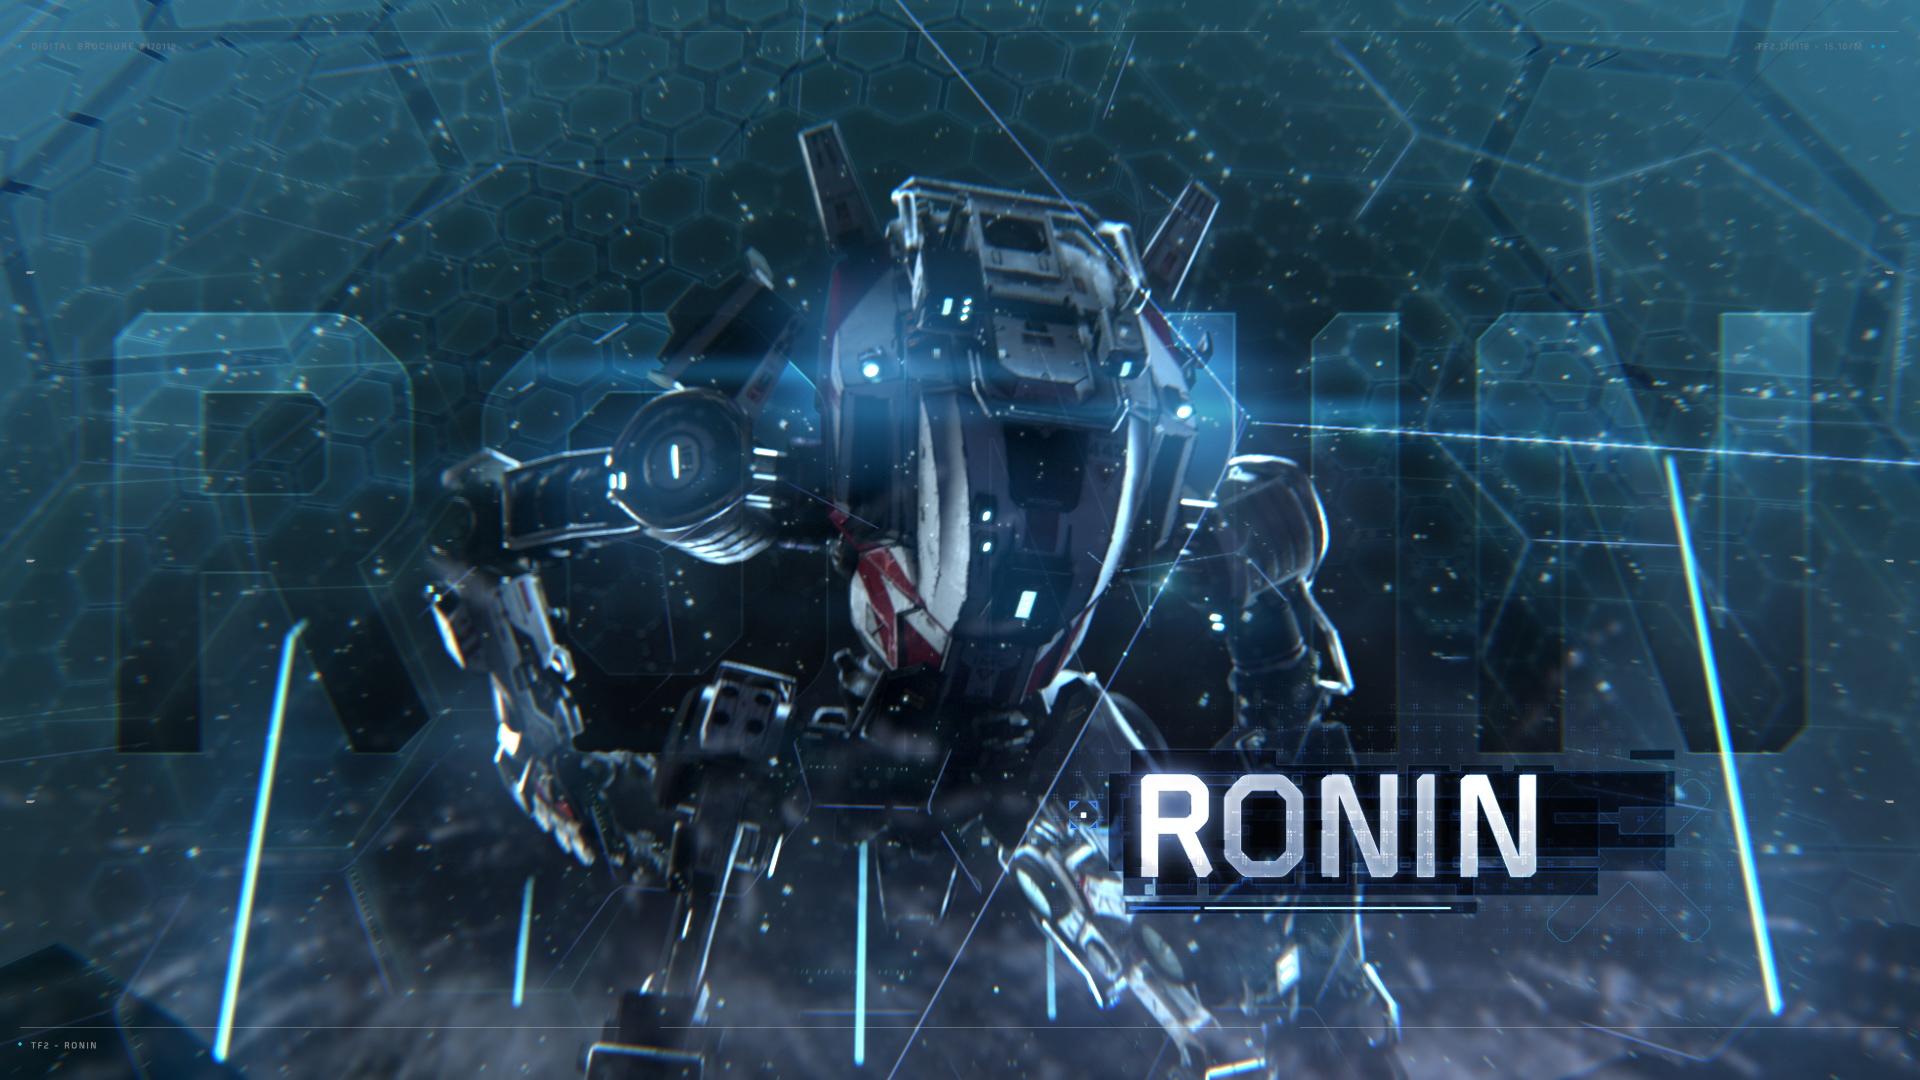 tf2_ronin_001.jpg